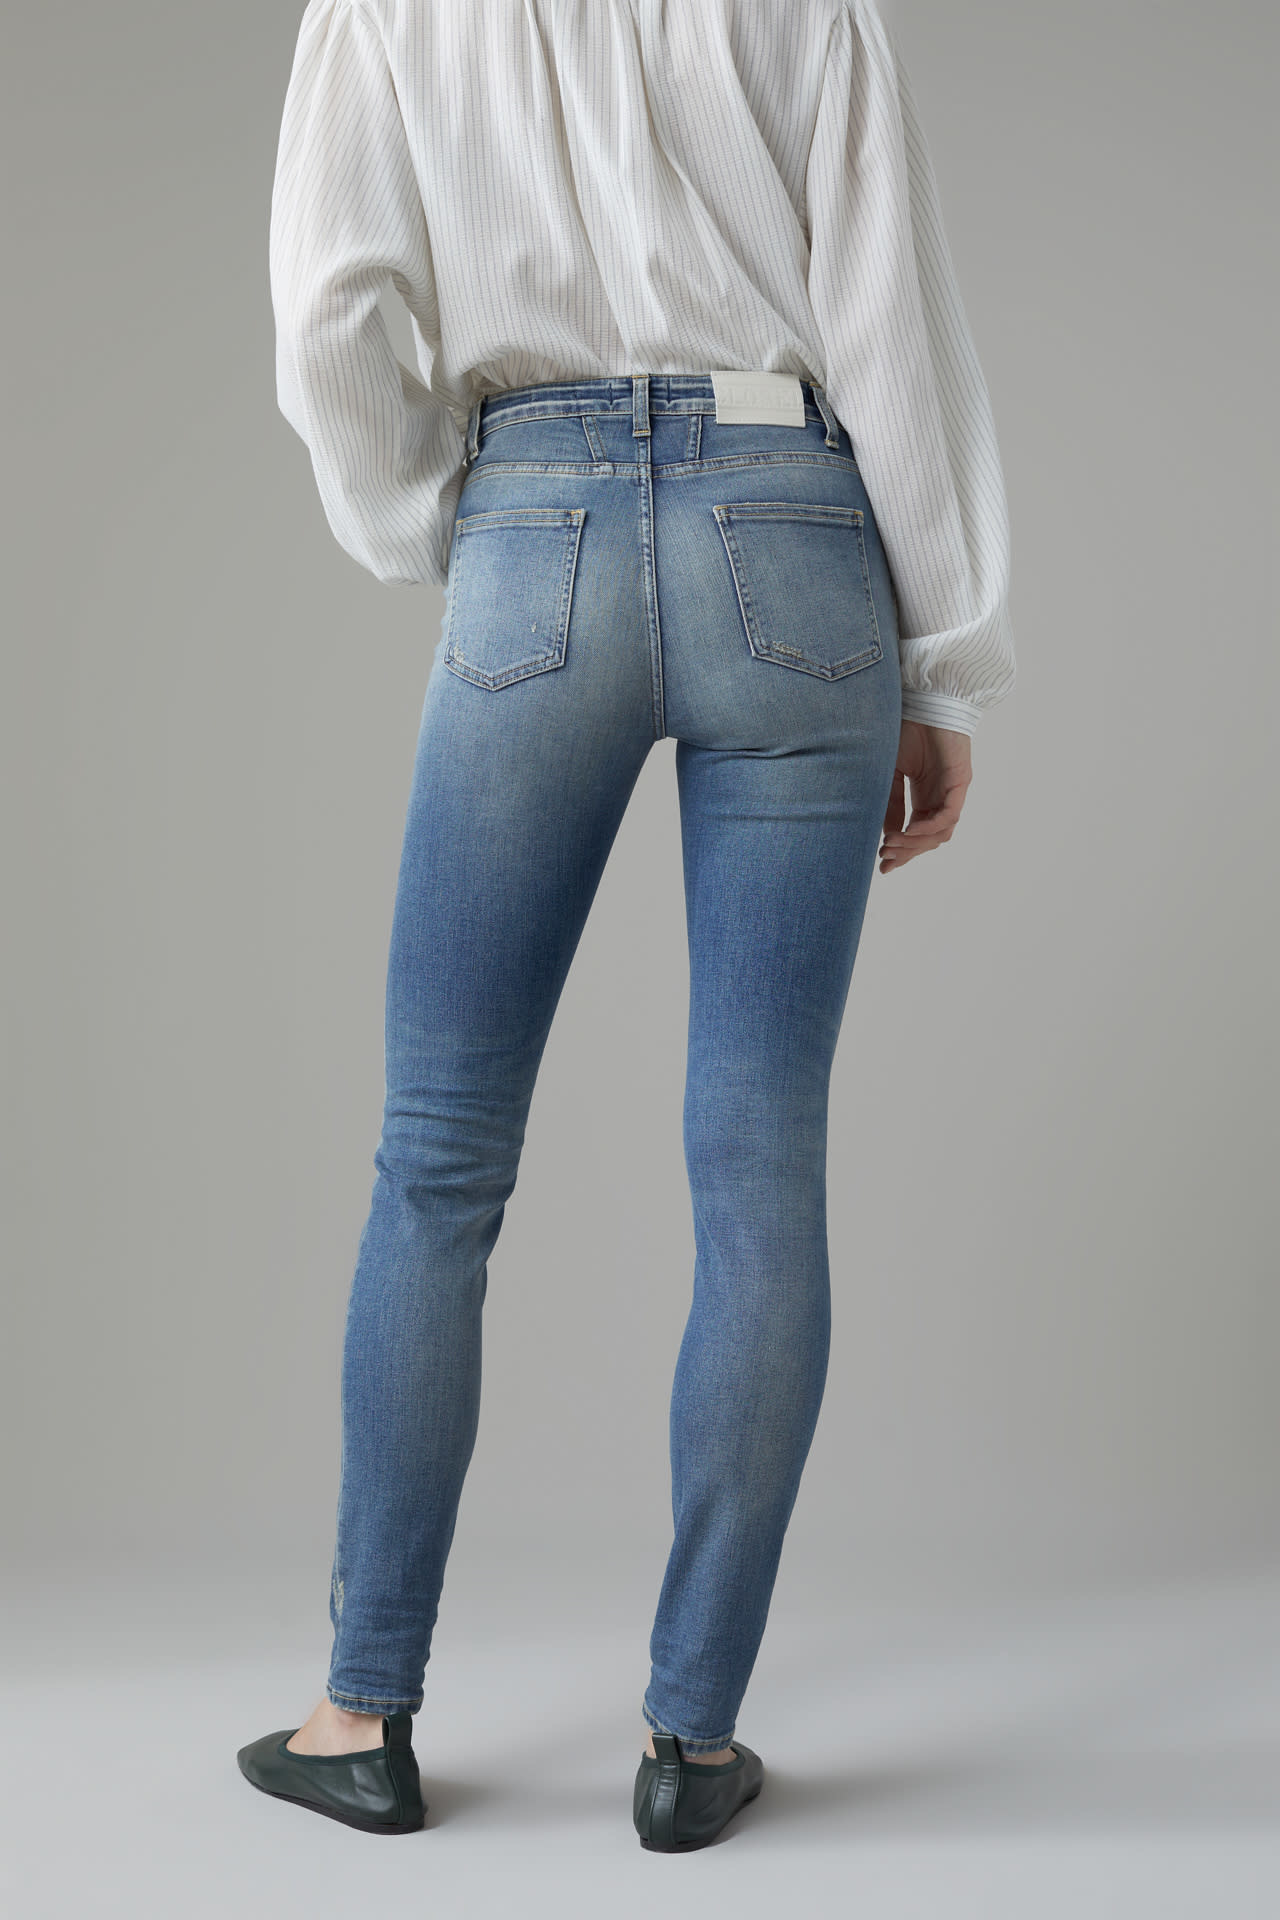 Lizzy Jeans - Organic Blue-2